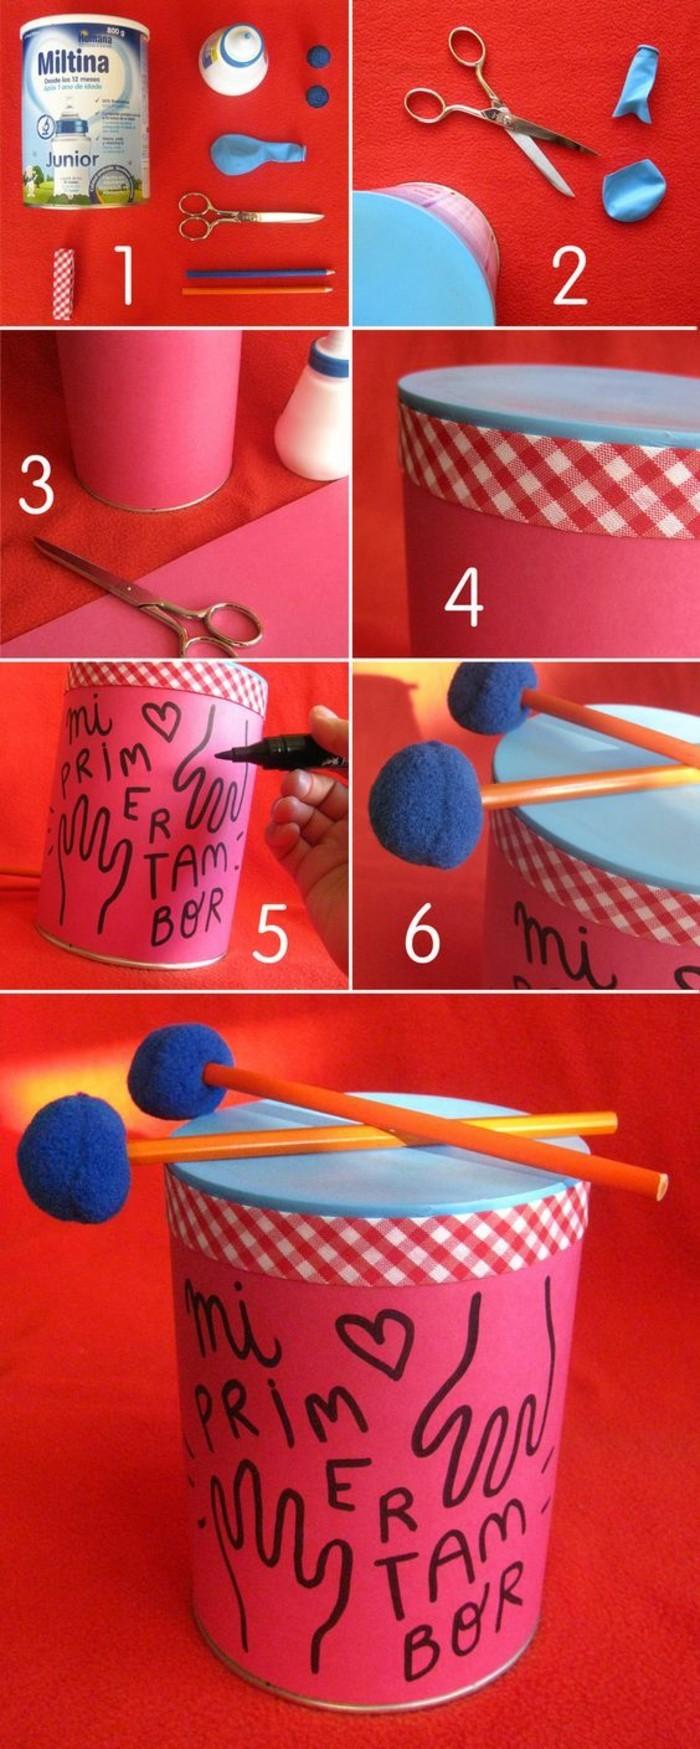 kreative-bastelideen-konservendose-washi-tapes-schere-balon-trommel